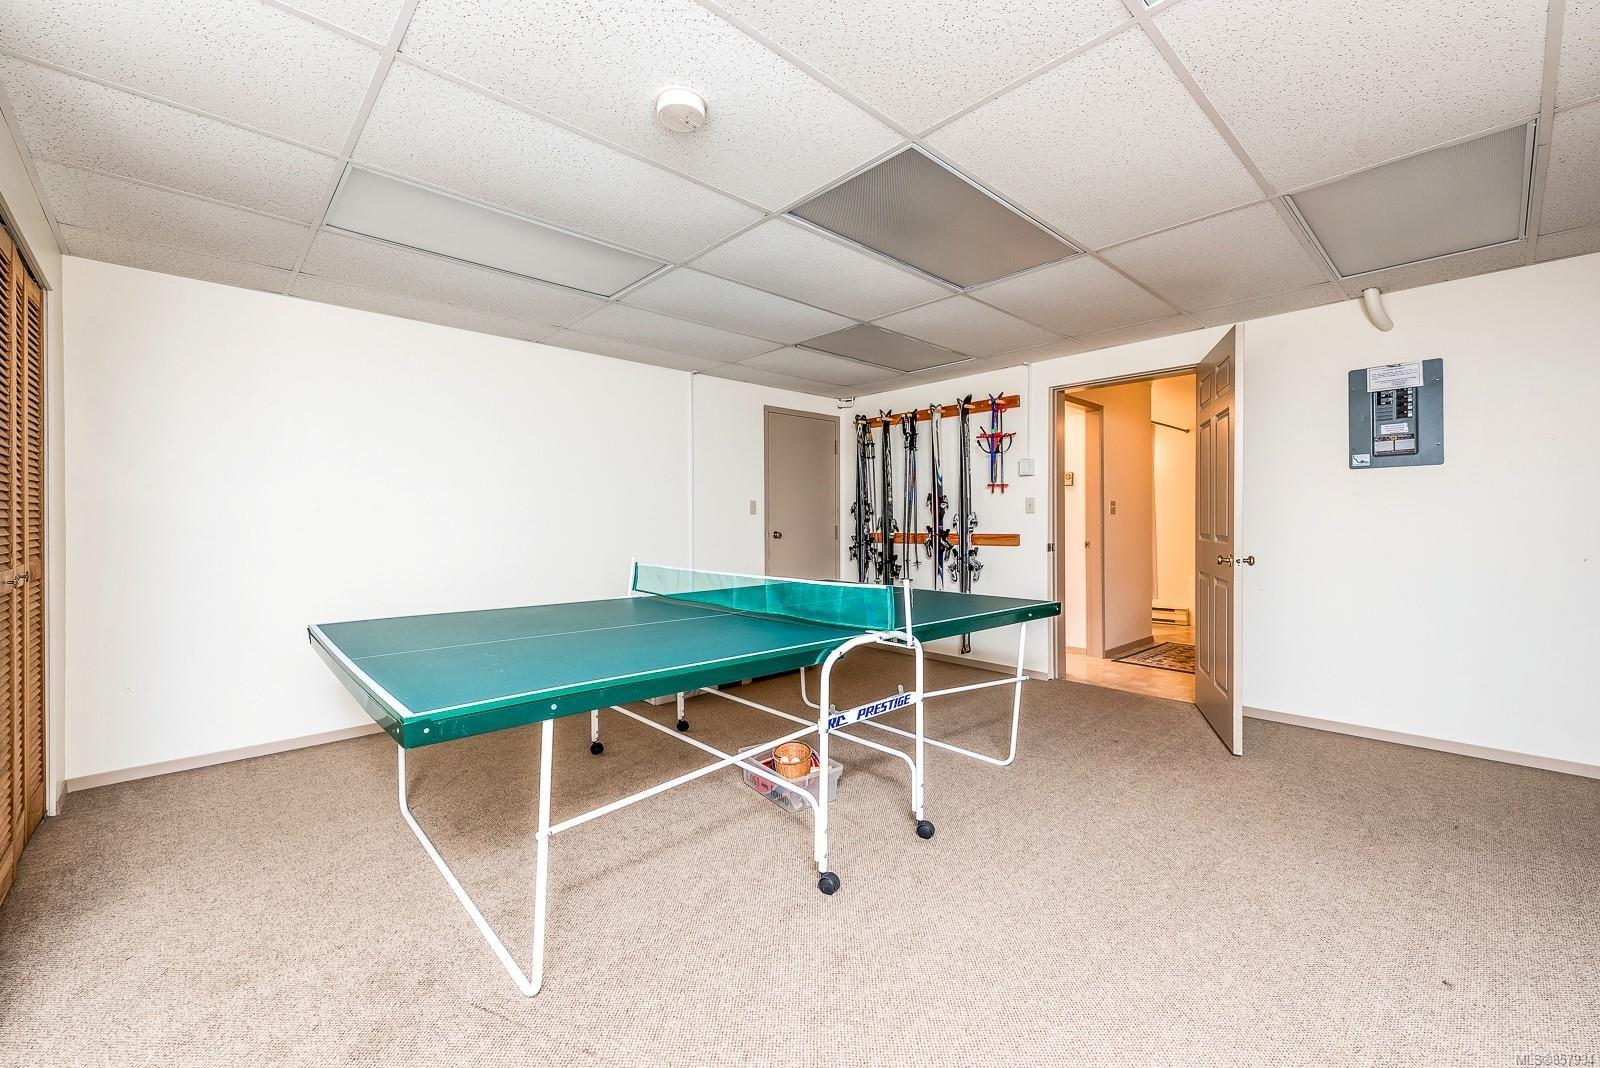 Photo 19: Photos: 998 STRATA Way in : CV Mt Washington House for sale (Comox Valley)  : MLS®# 857934